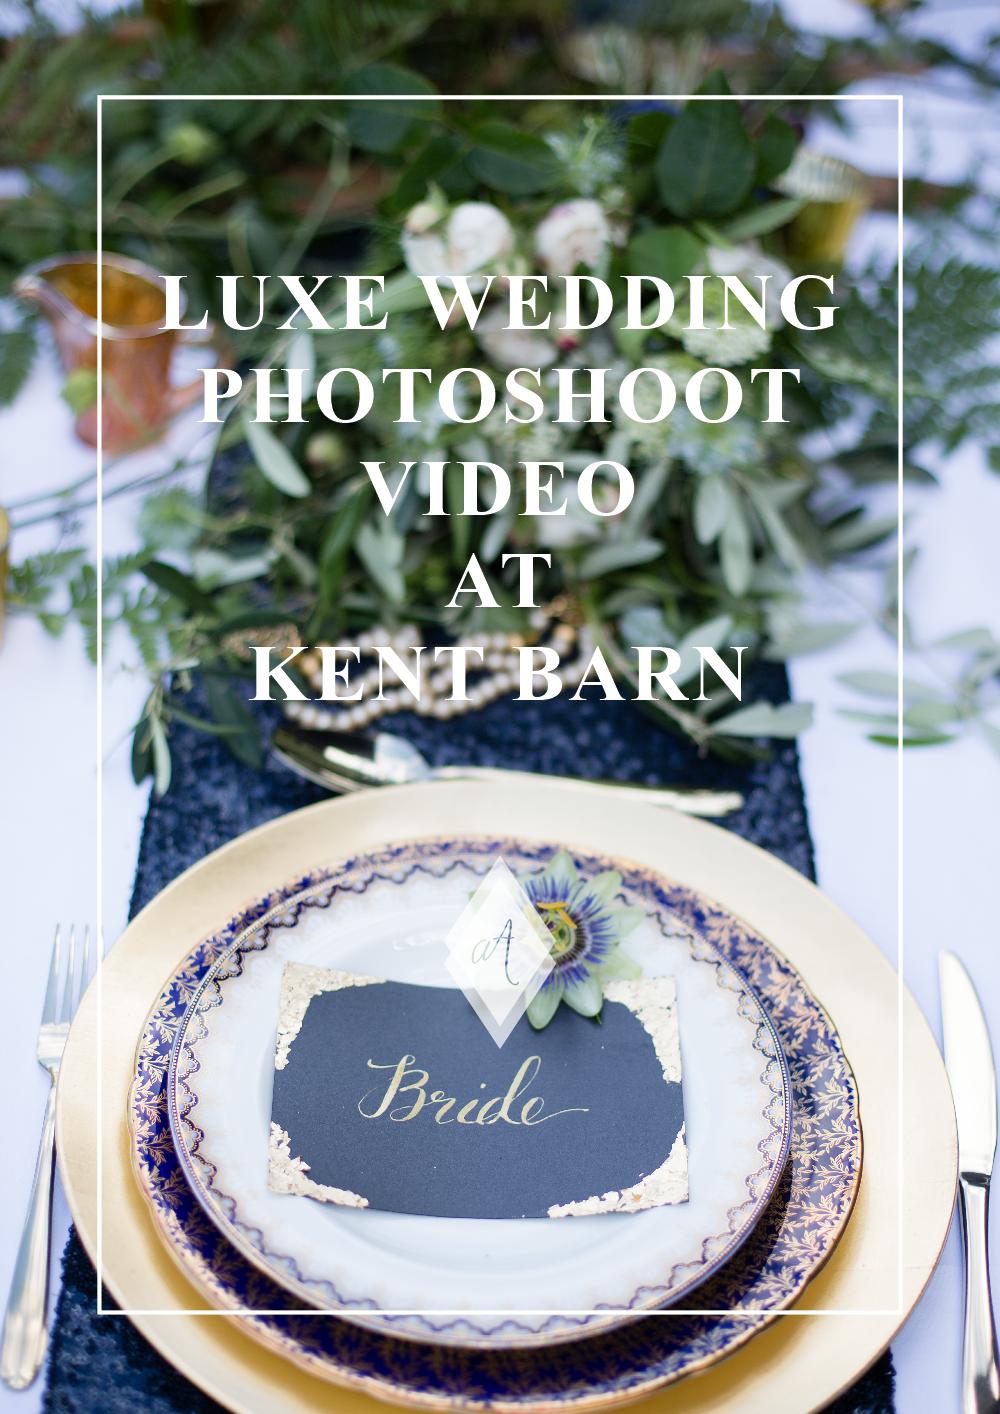 Luxe wedding photoshoot video at Kent barn Always Andri